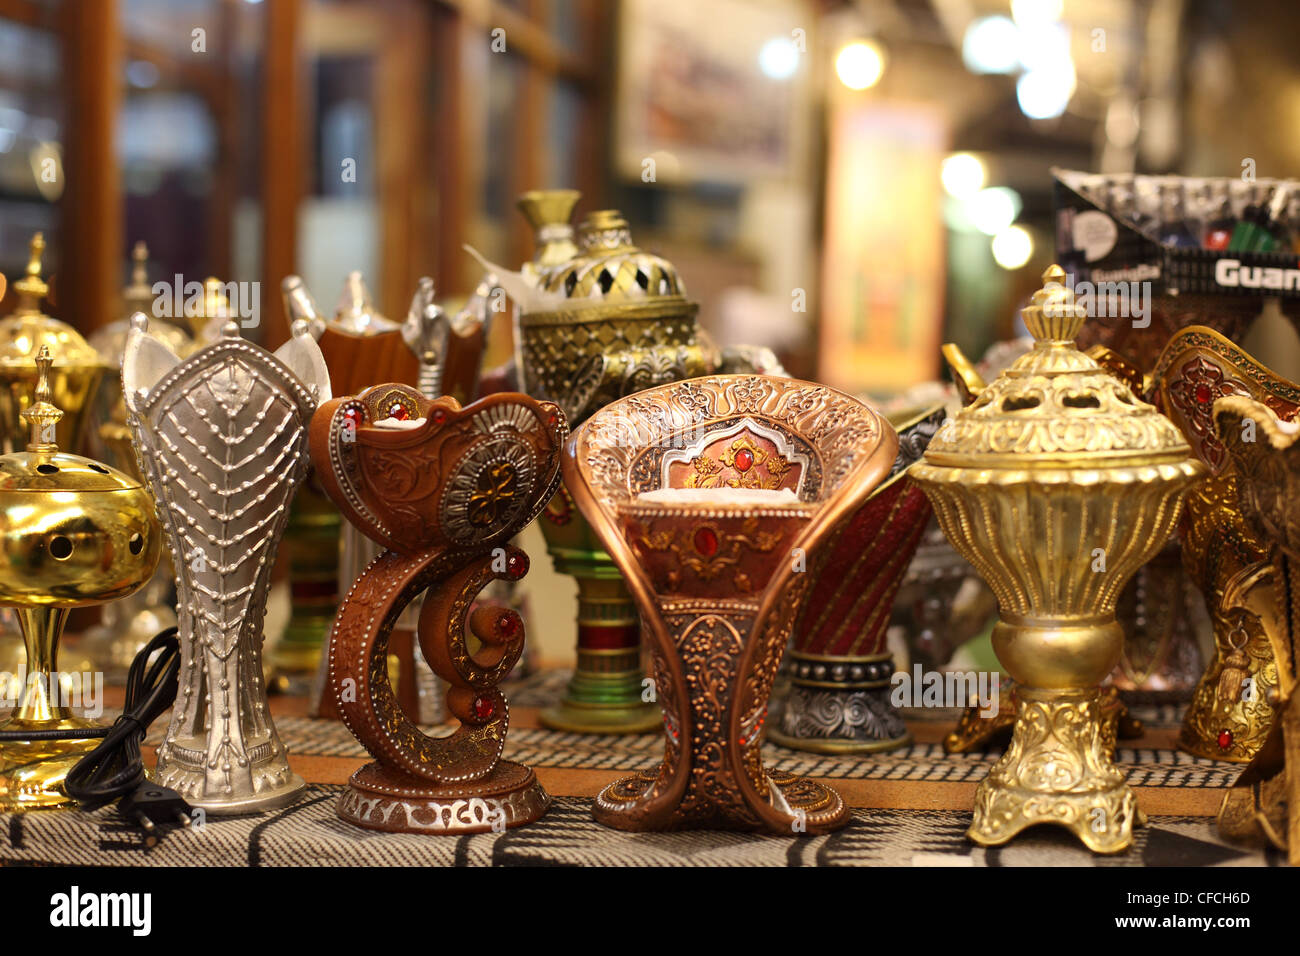 Traditional Arabic incense burner in Doha, Qatar - Stock Image